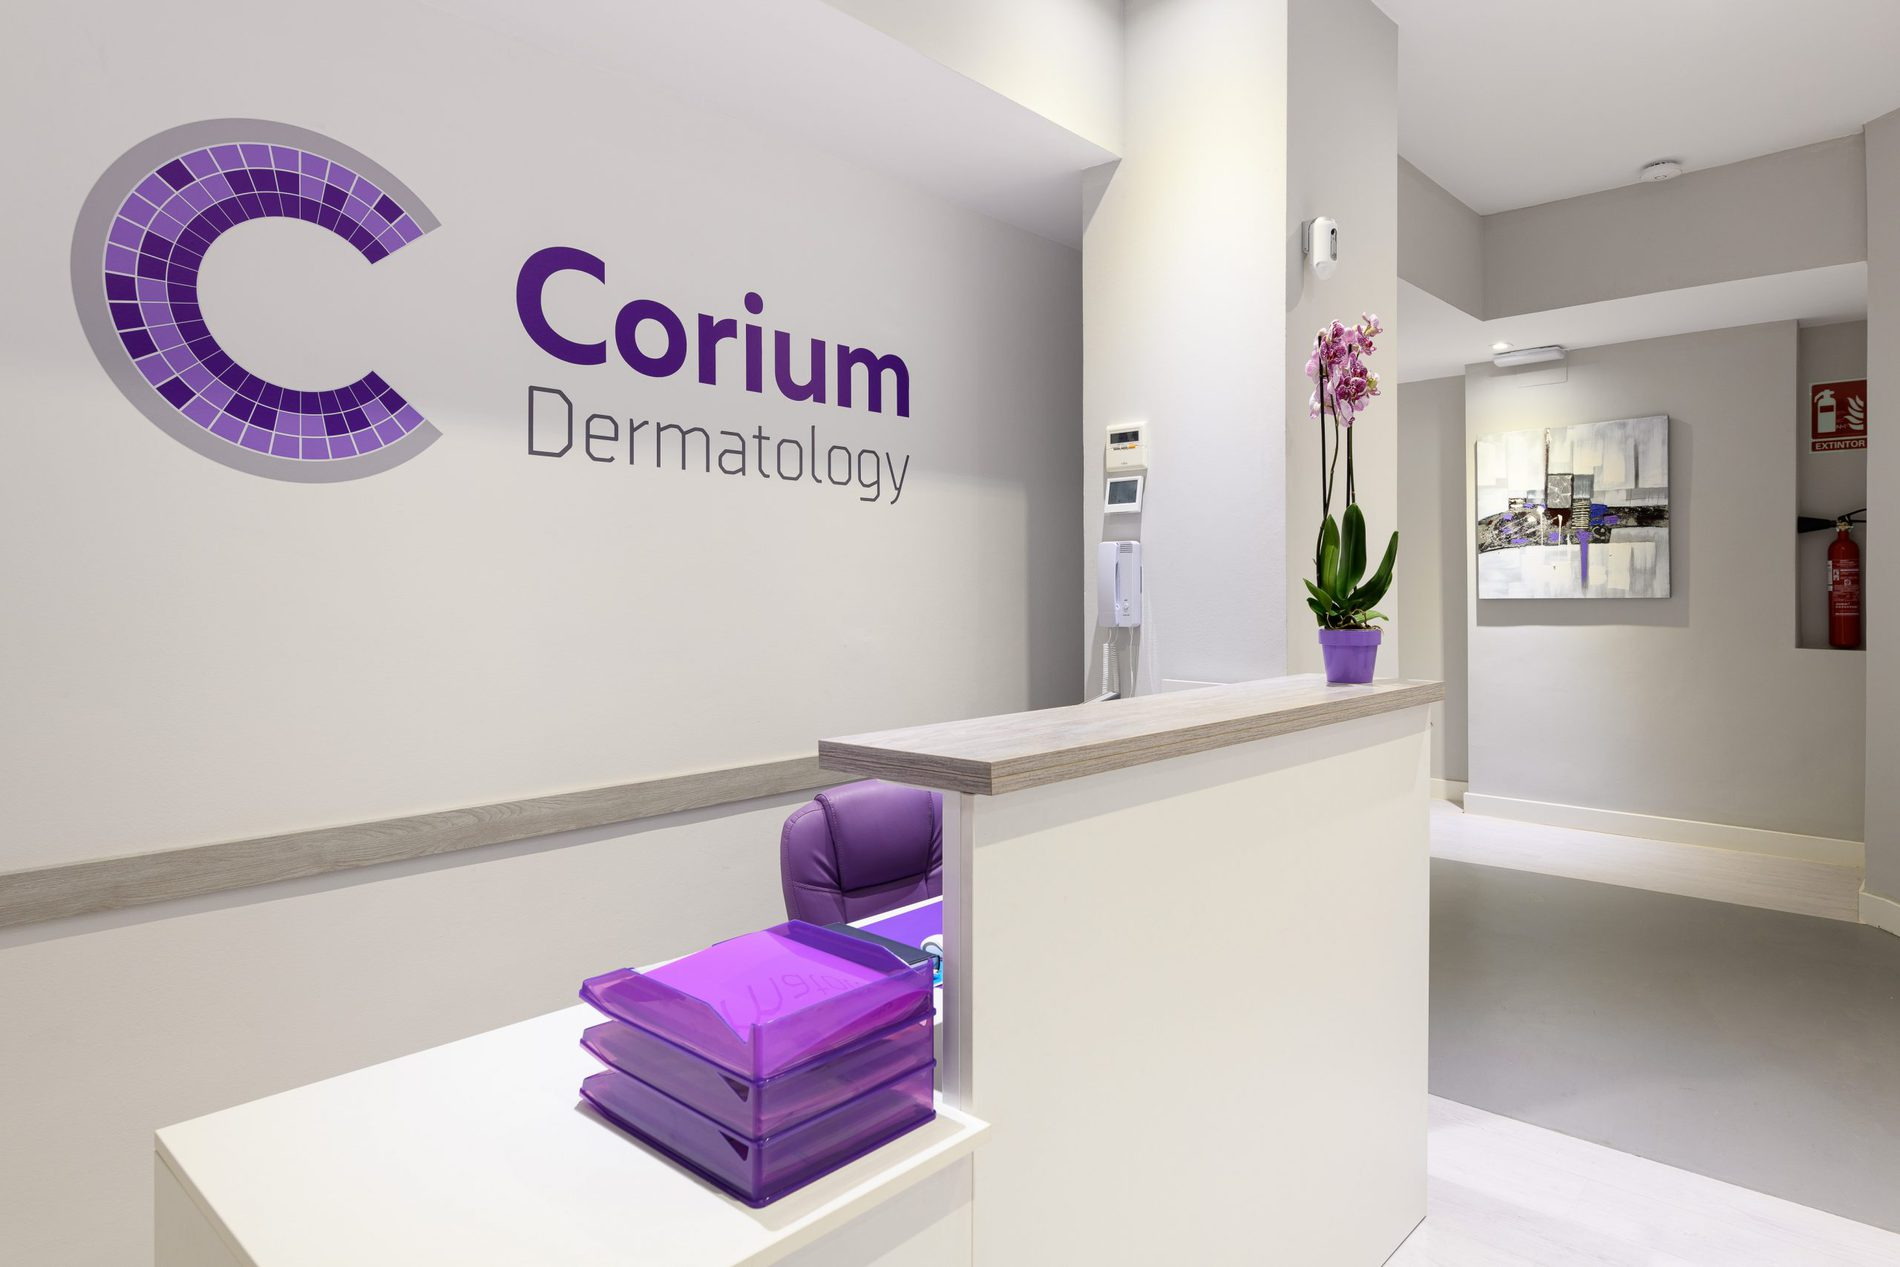 recepción Corium Dermatology